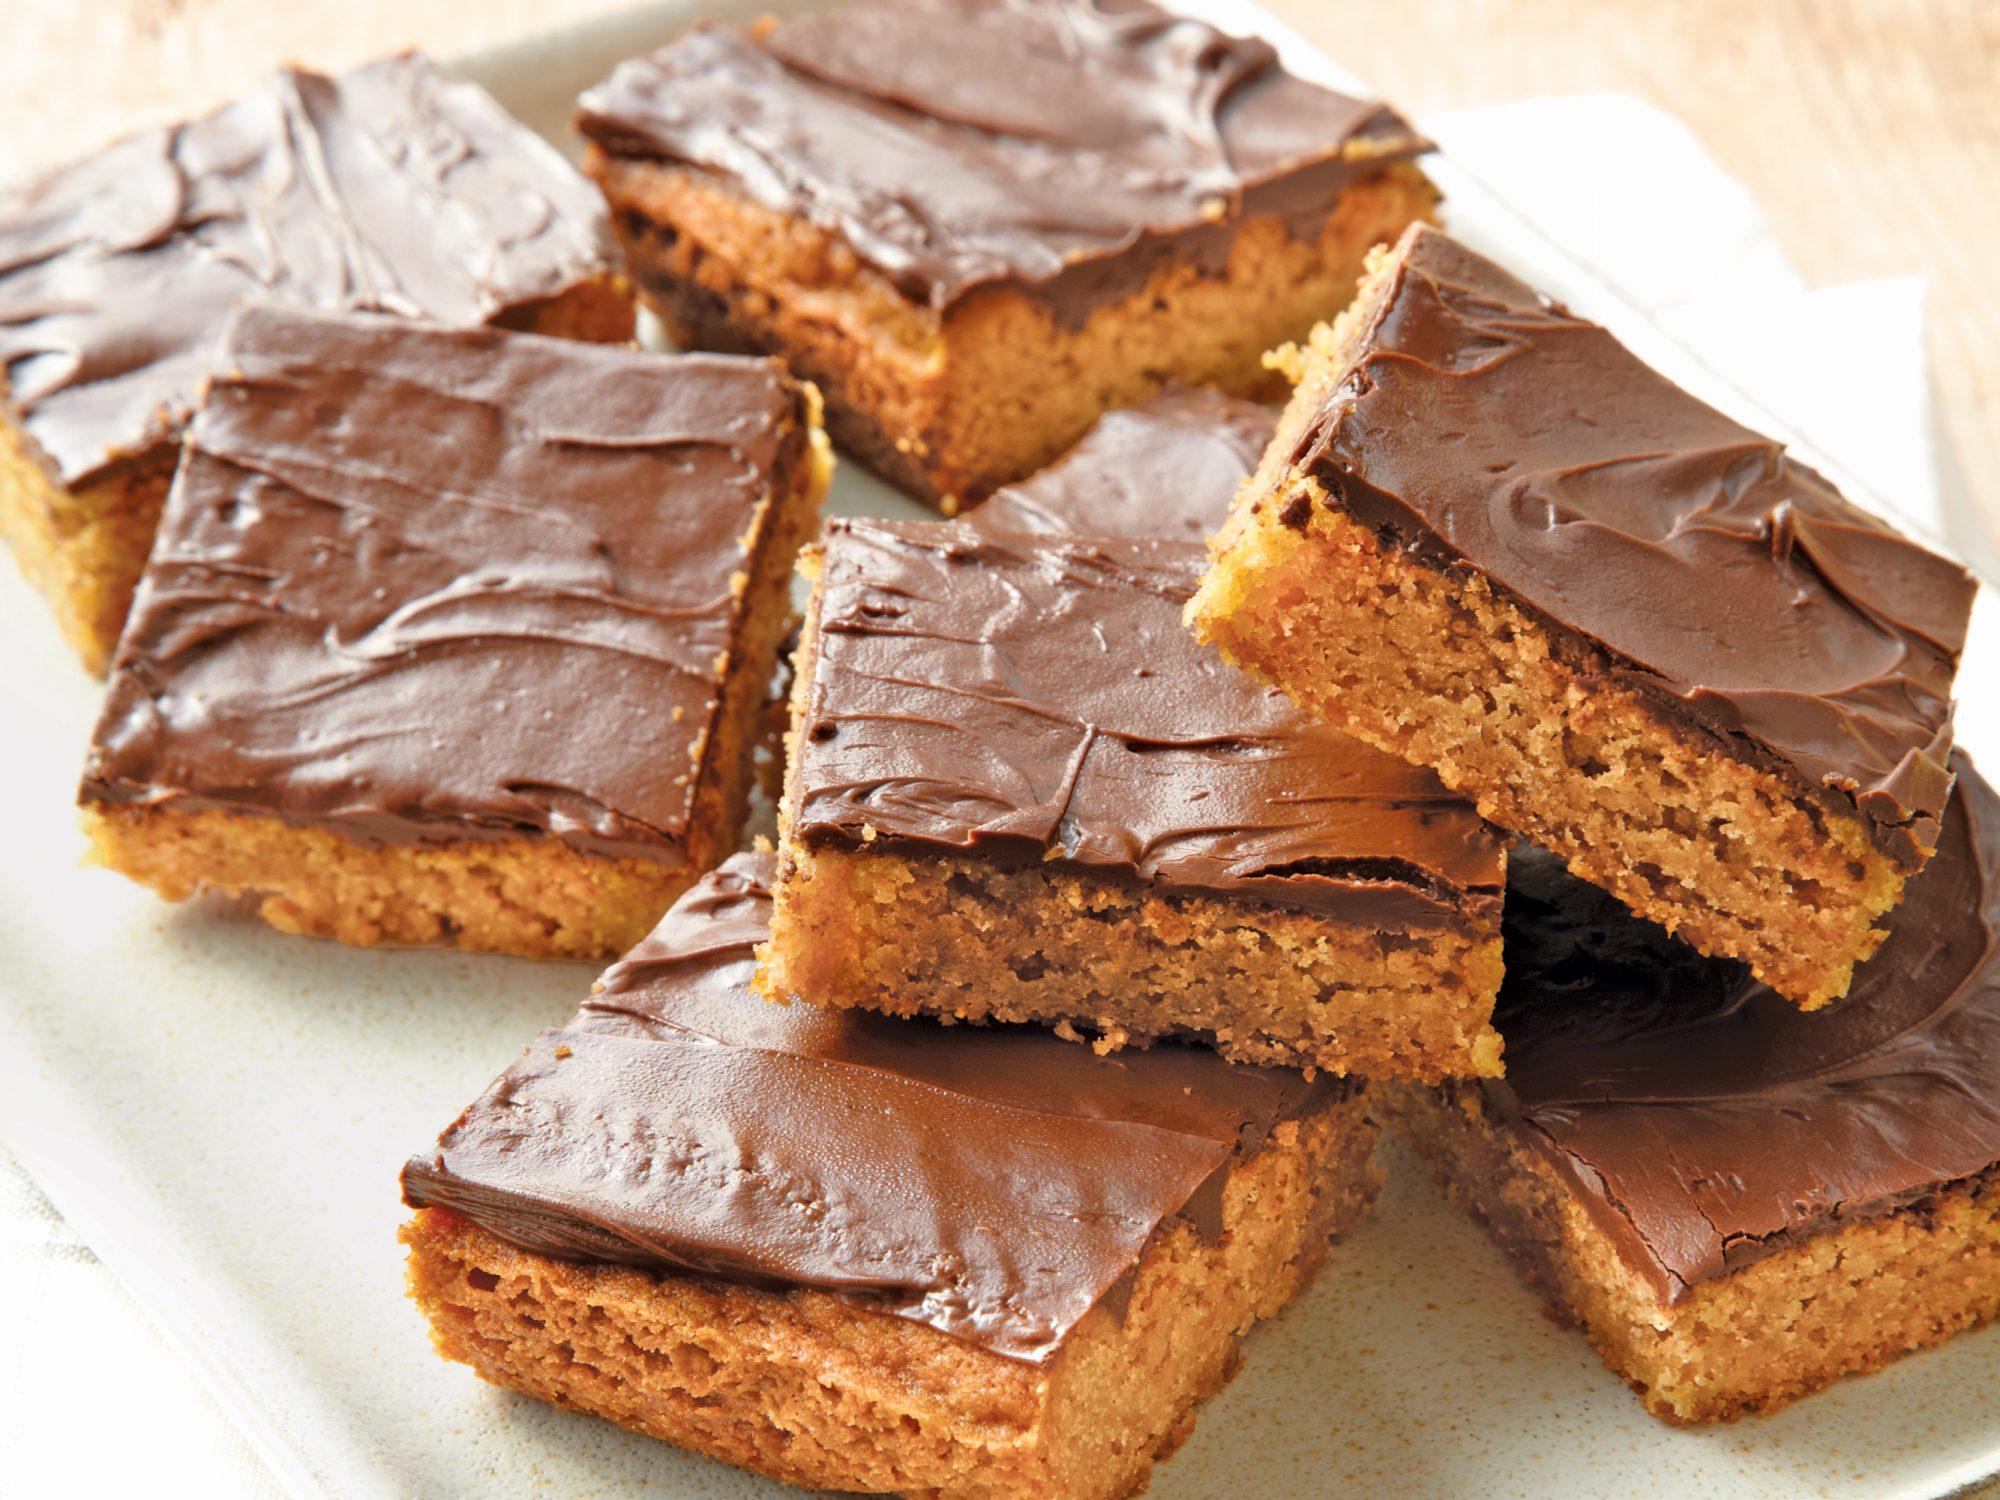 Chocolate-Peanut Butter Bars